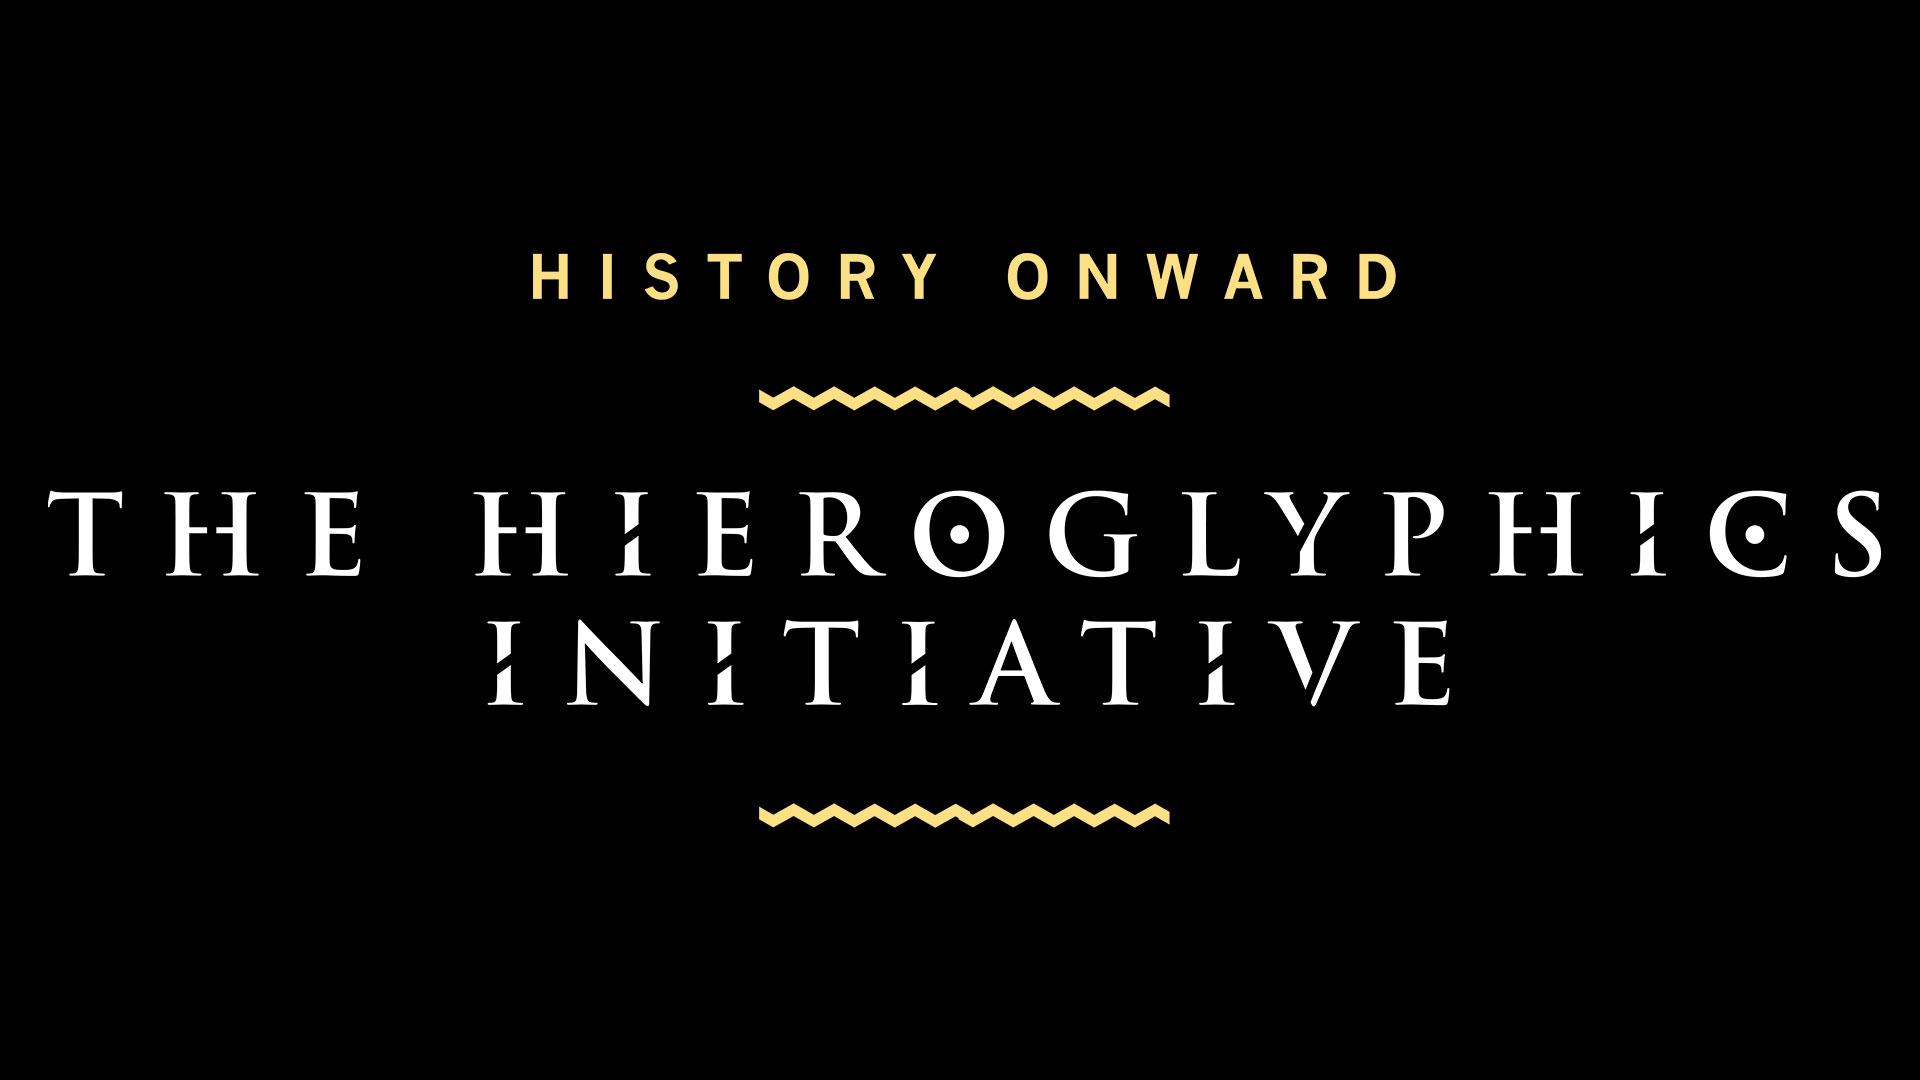 The Hieroglyphics Initiative